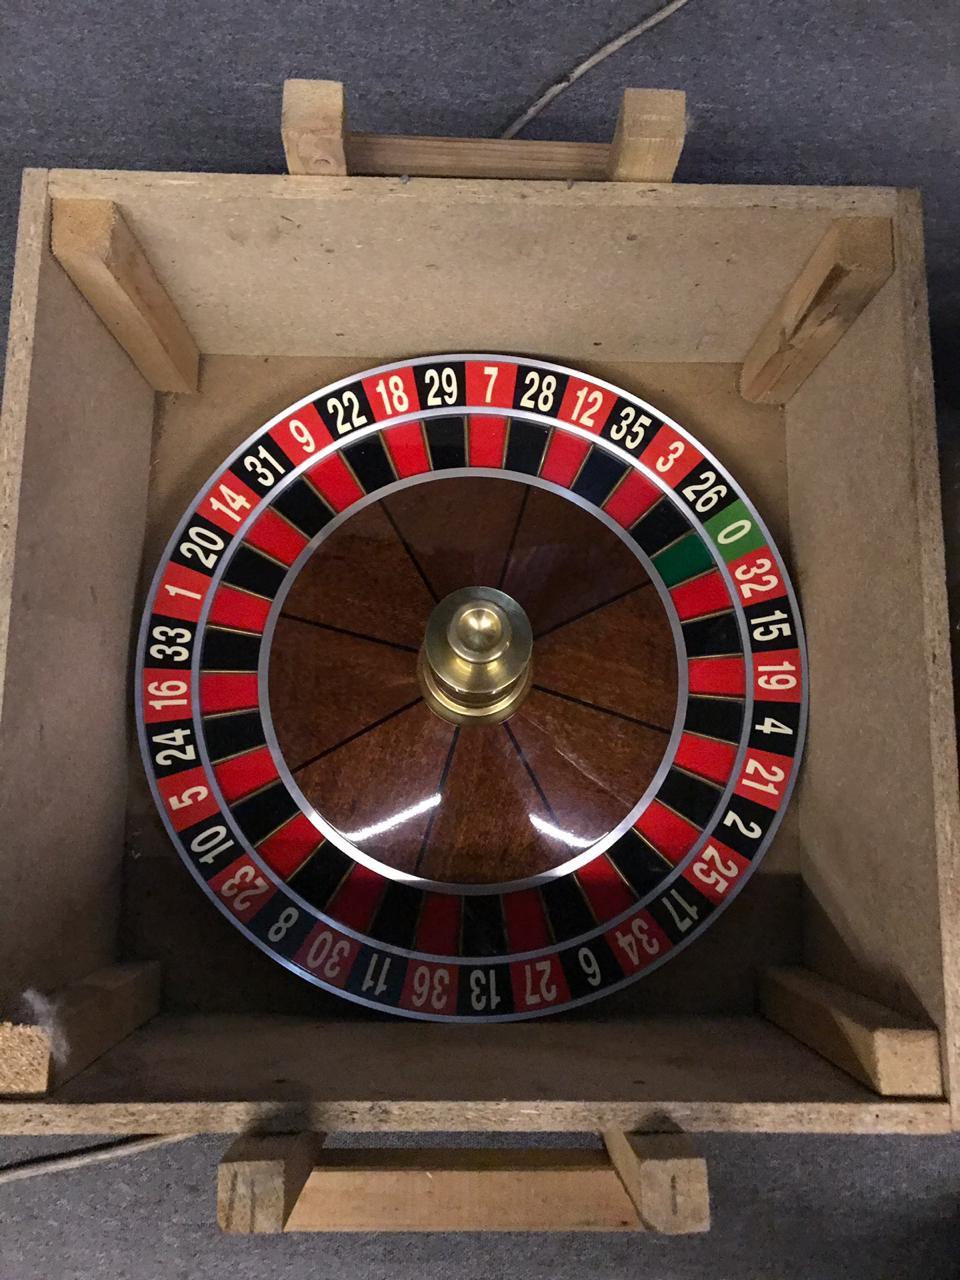 Ice casino зеркало